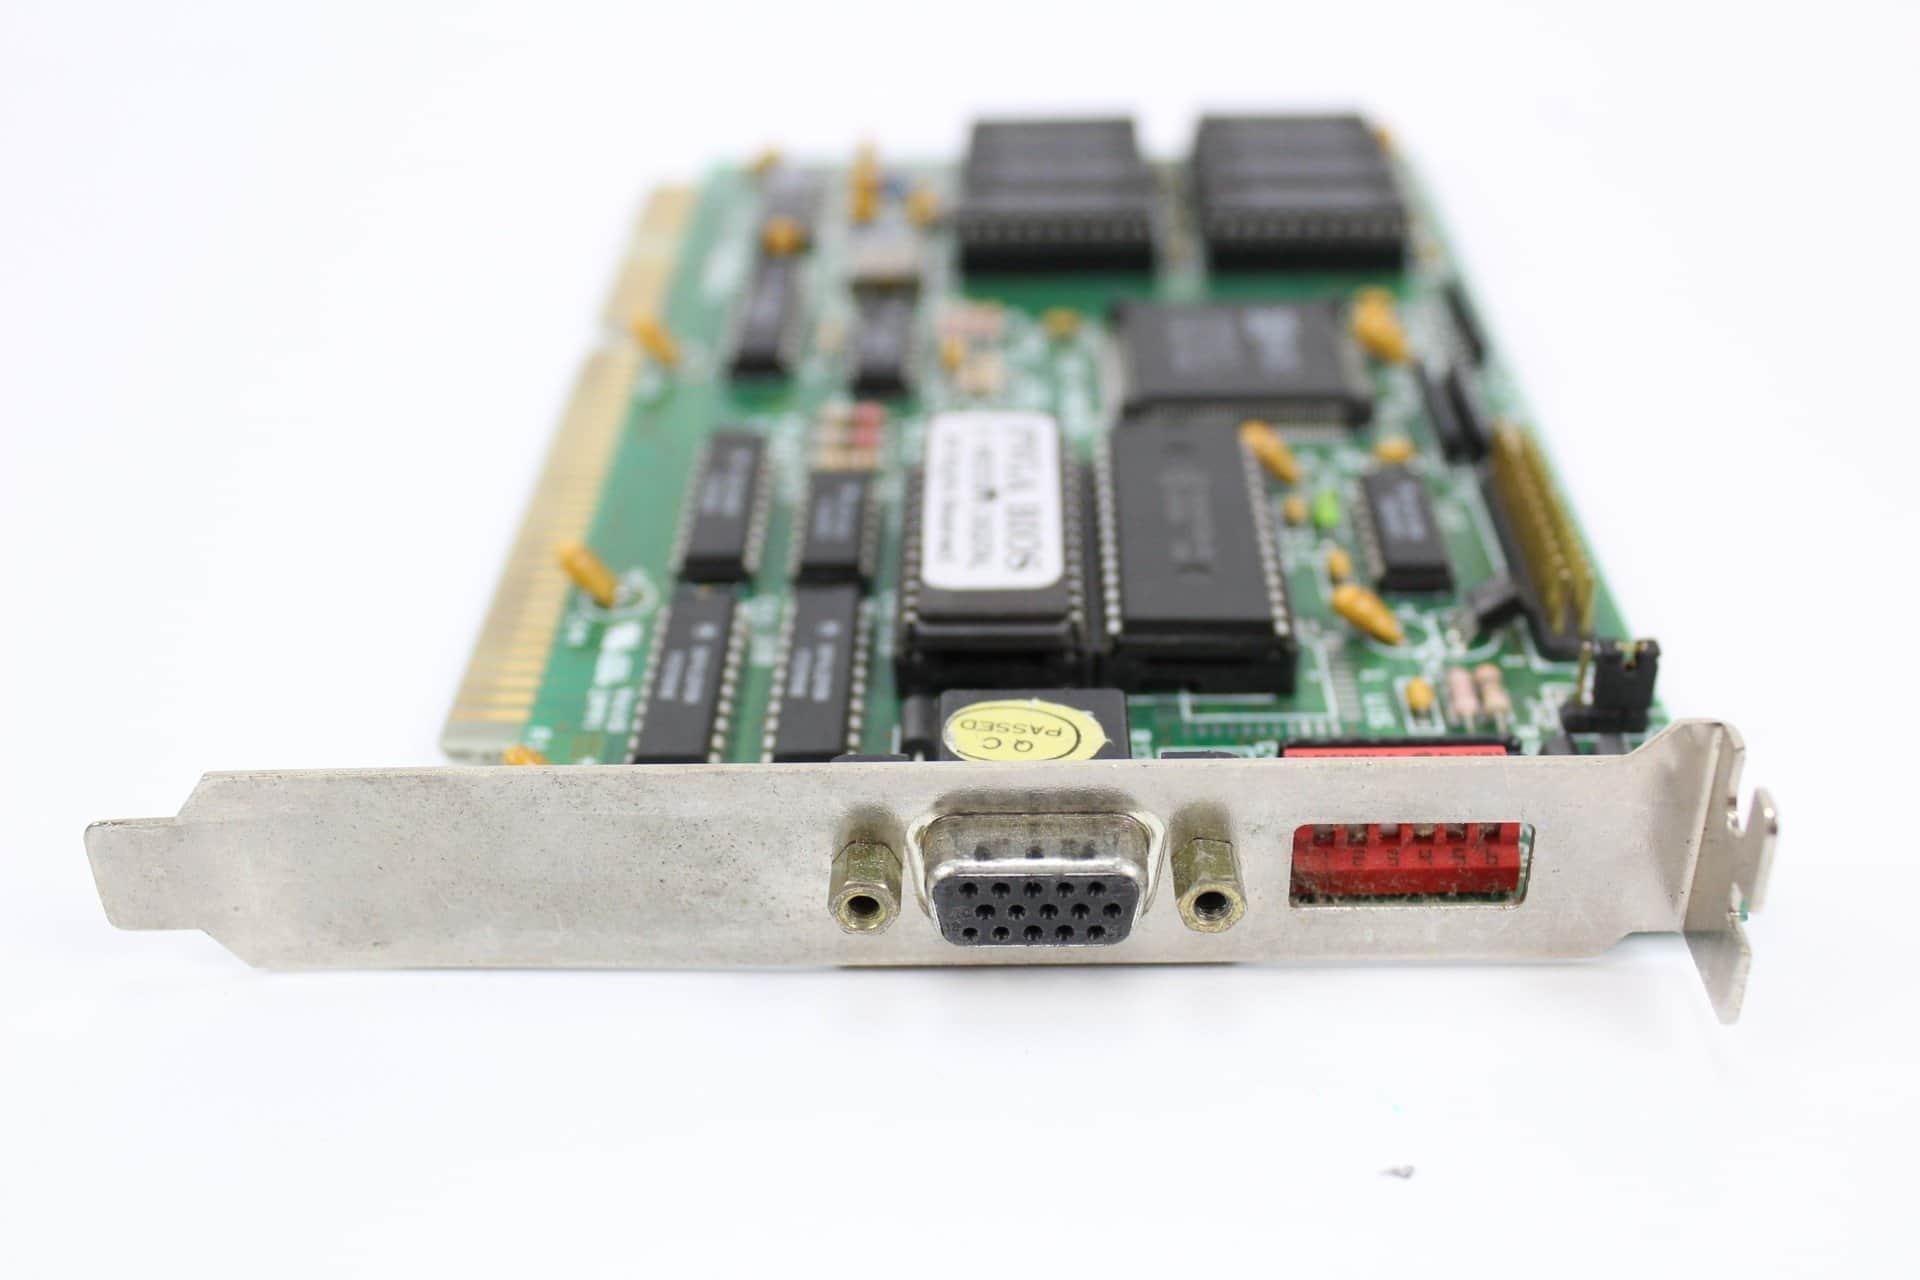 03940ceec ... Grafická karta ze strany konektoru - PC VUJO 286 na 25MHz ...